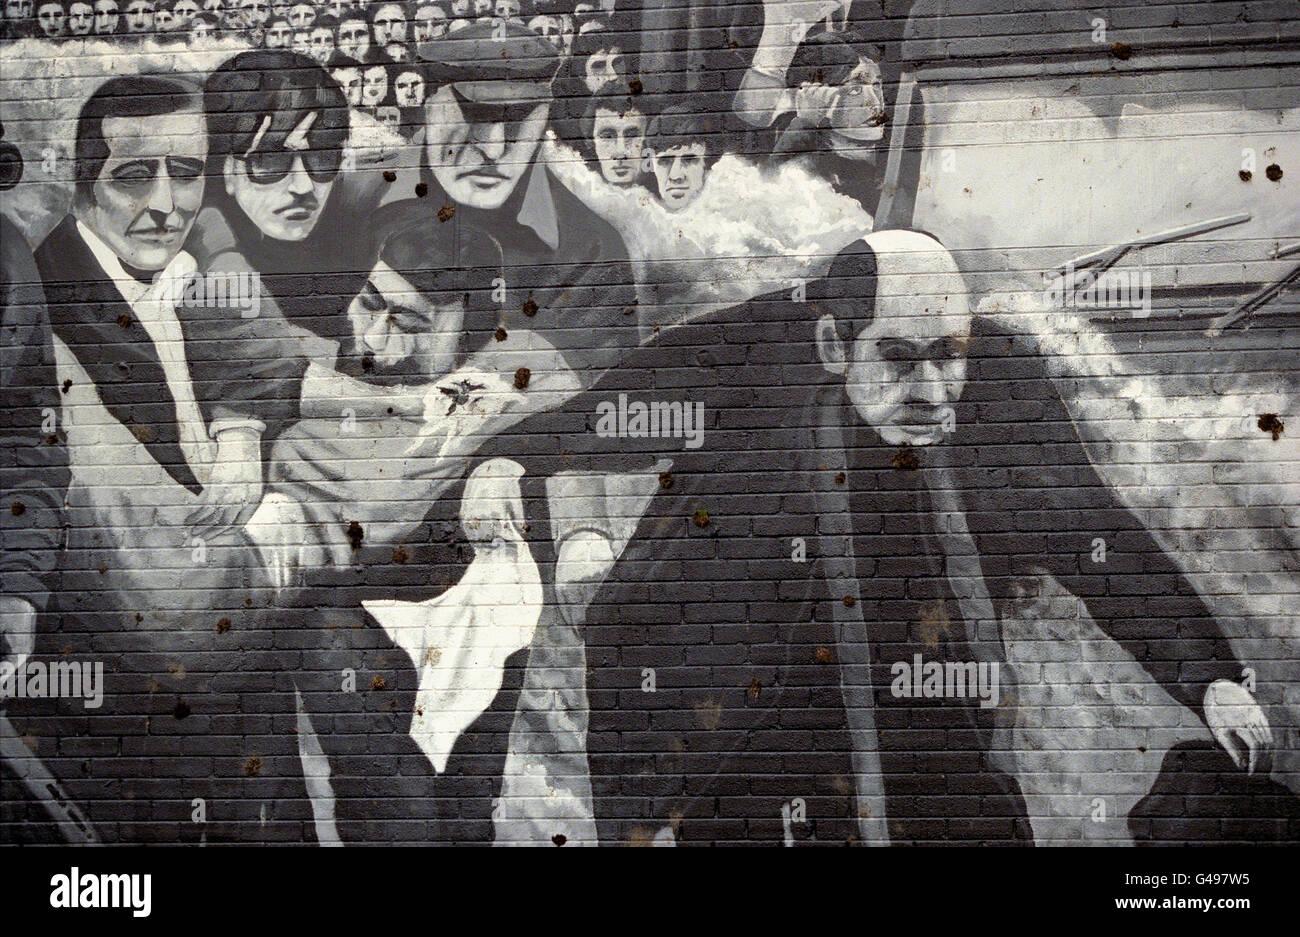 Mural/Free Derry Corner - Stock Image